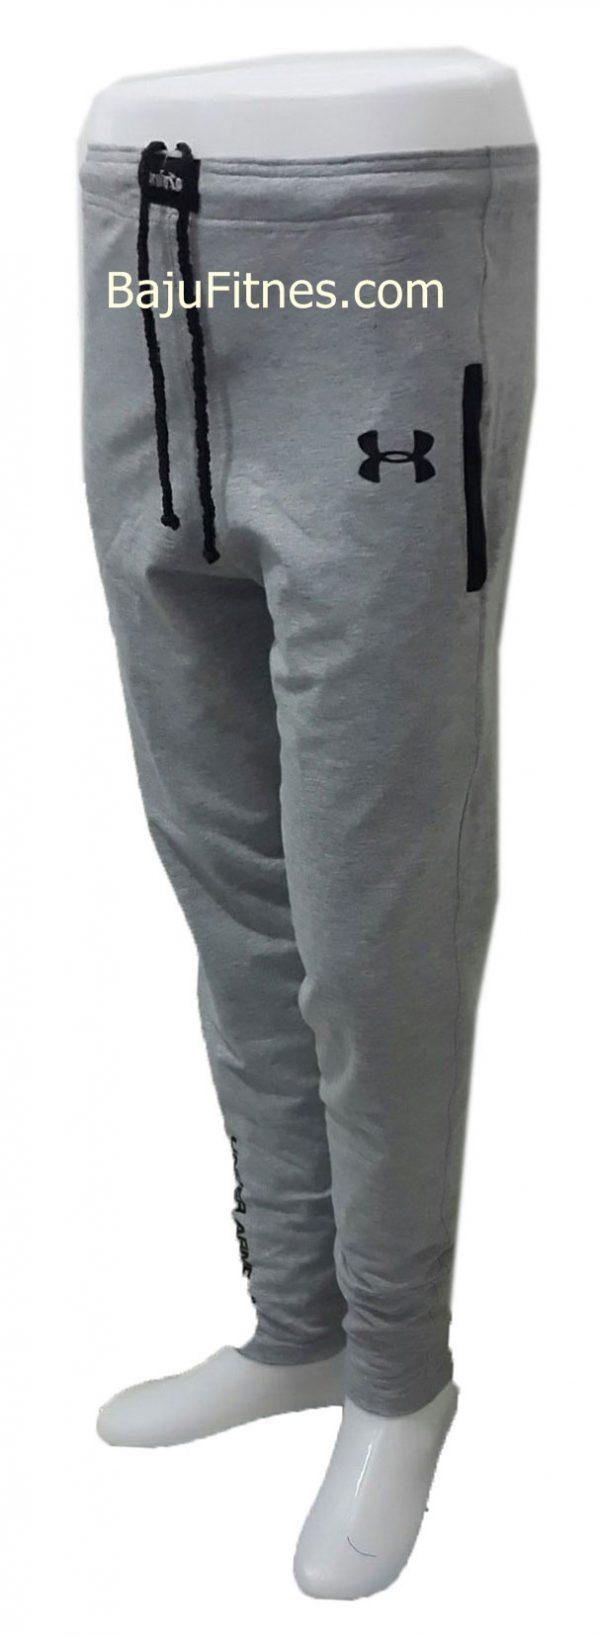 089506541896 Tri | 3216-harga-celana-fitnes-priakaskus